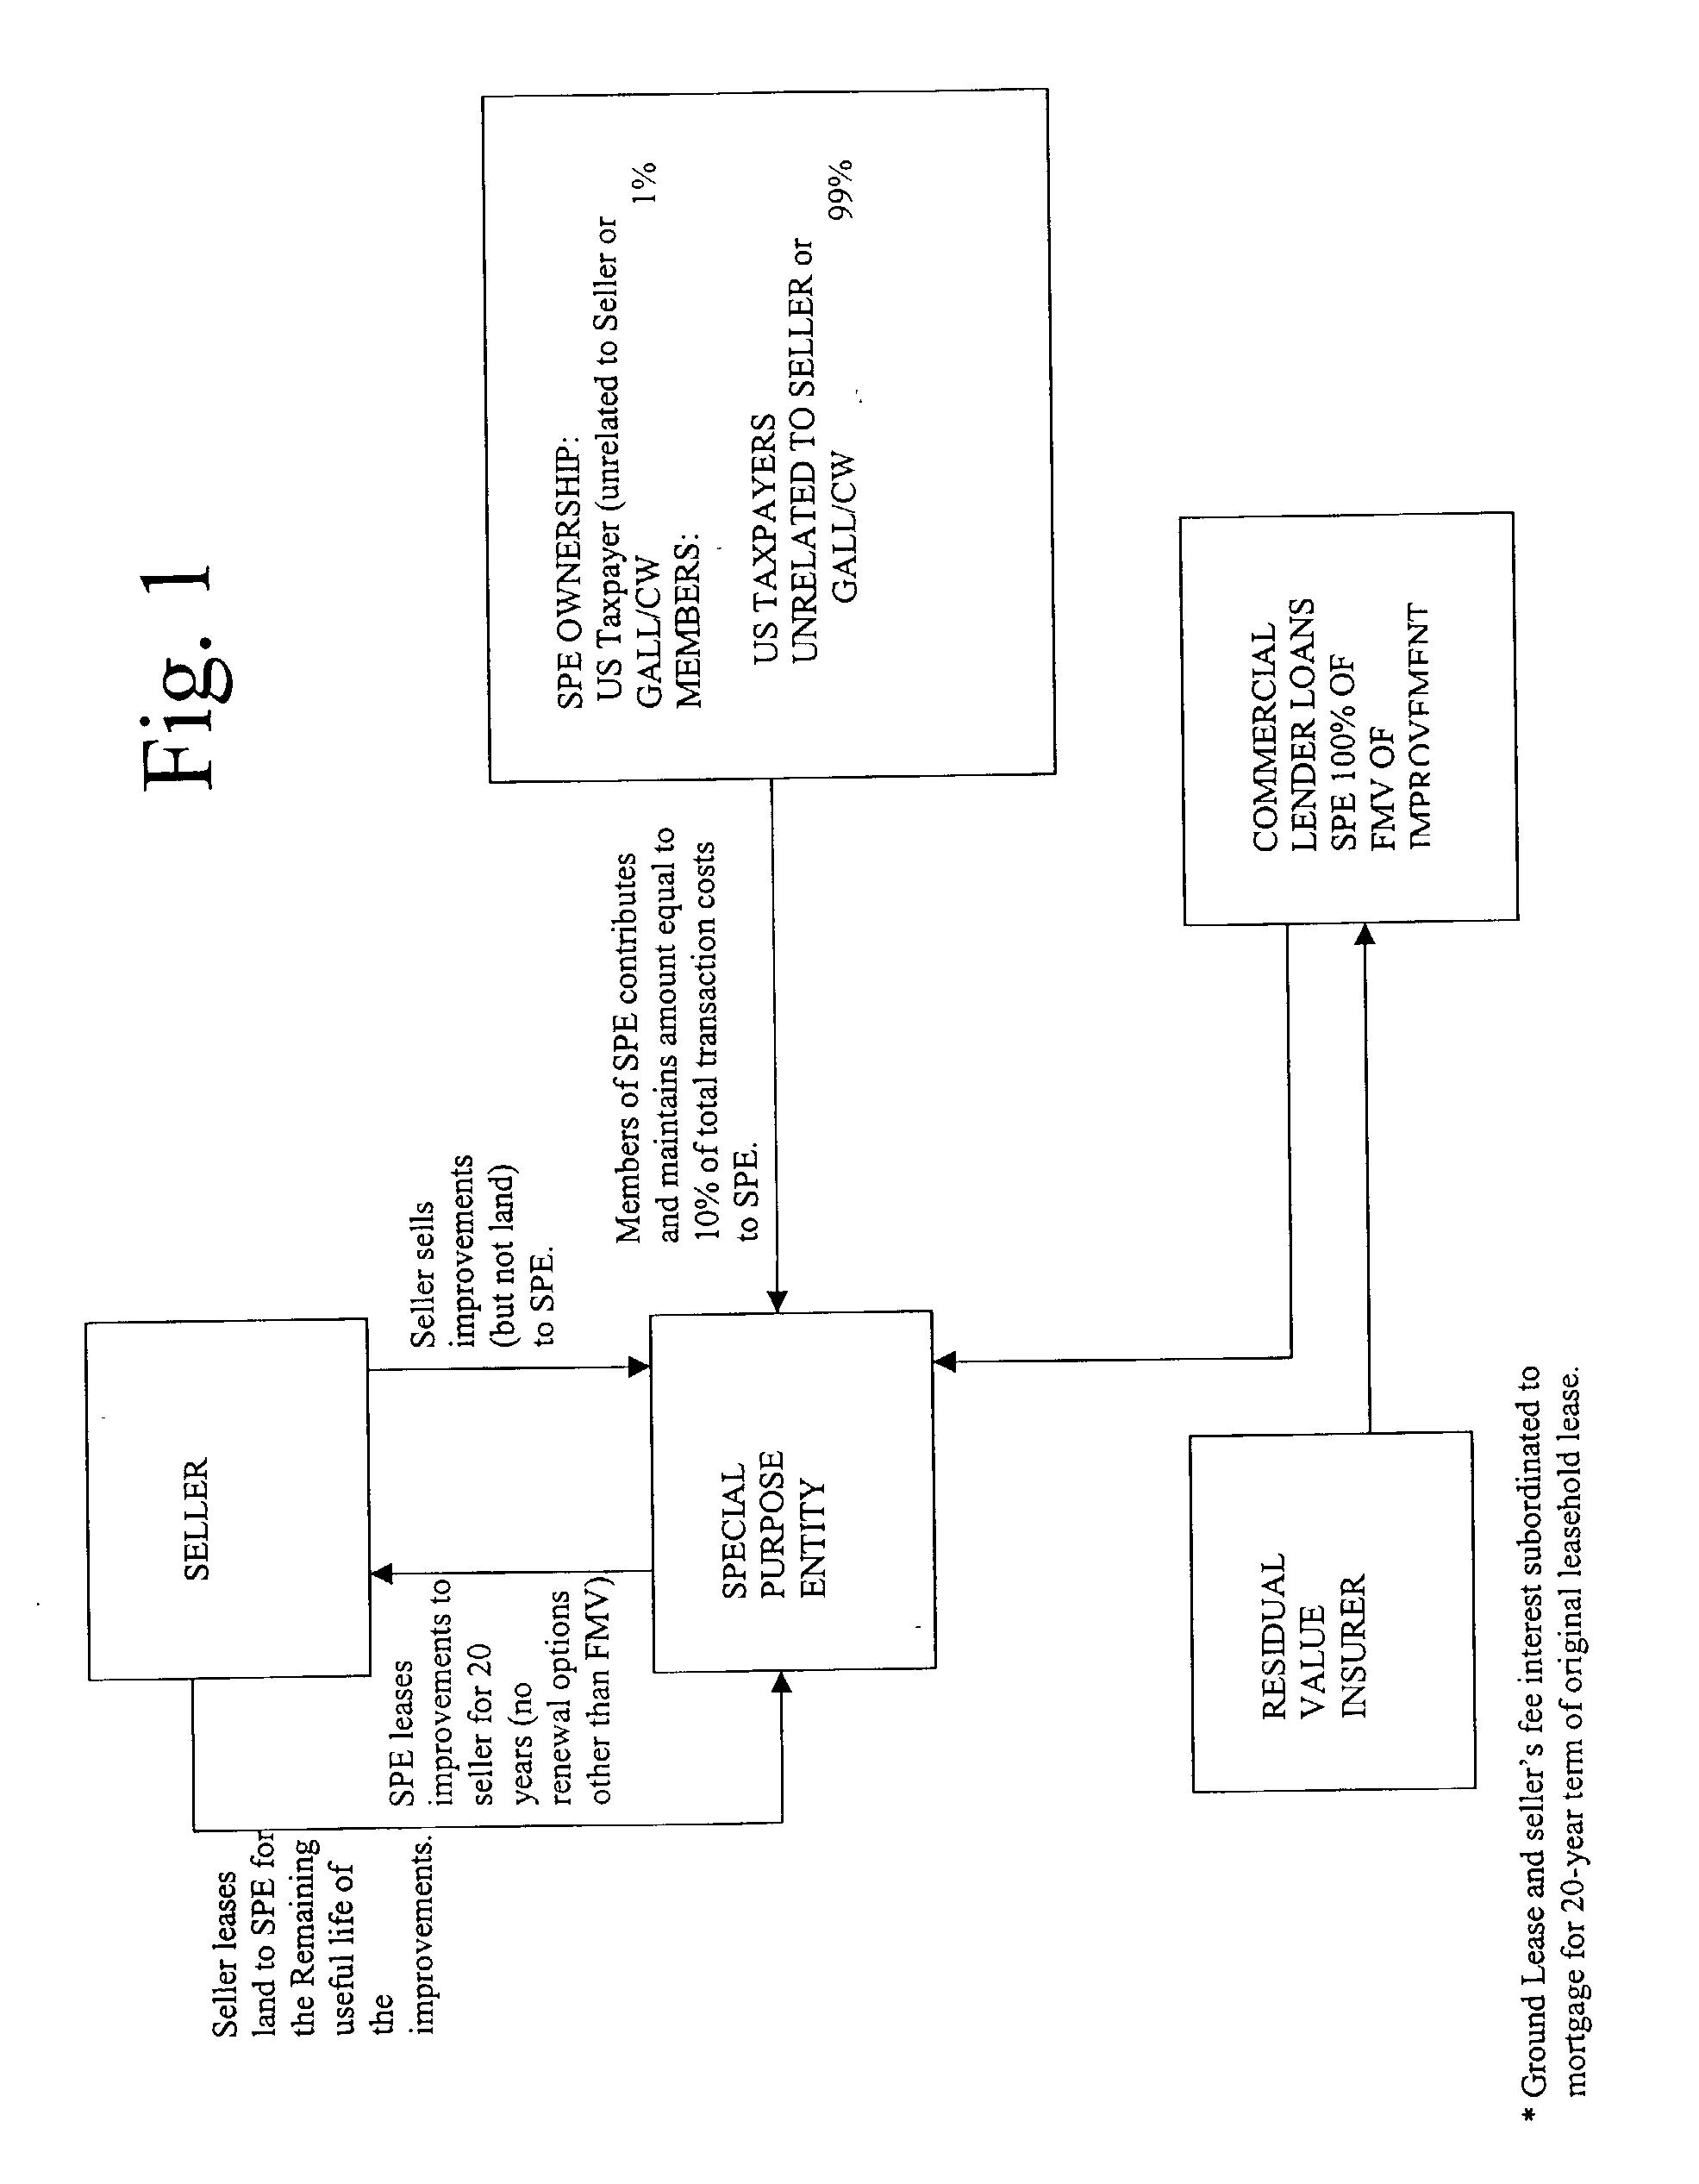 Social Enterprise Typology